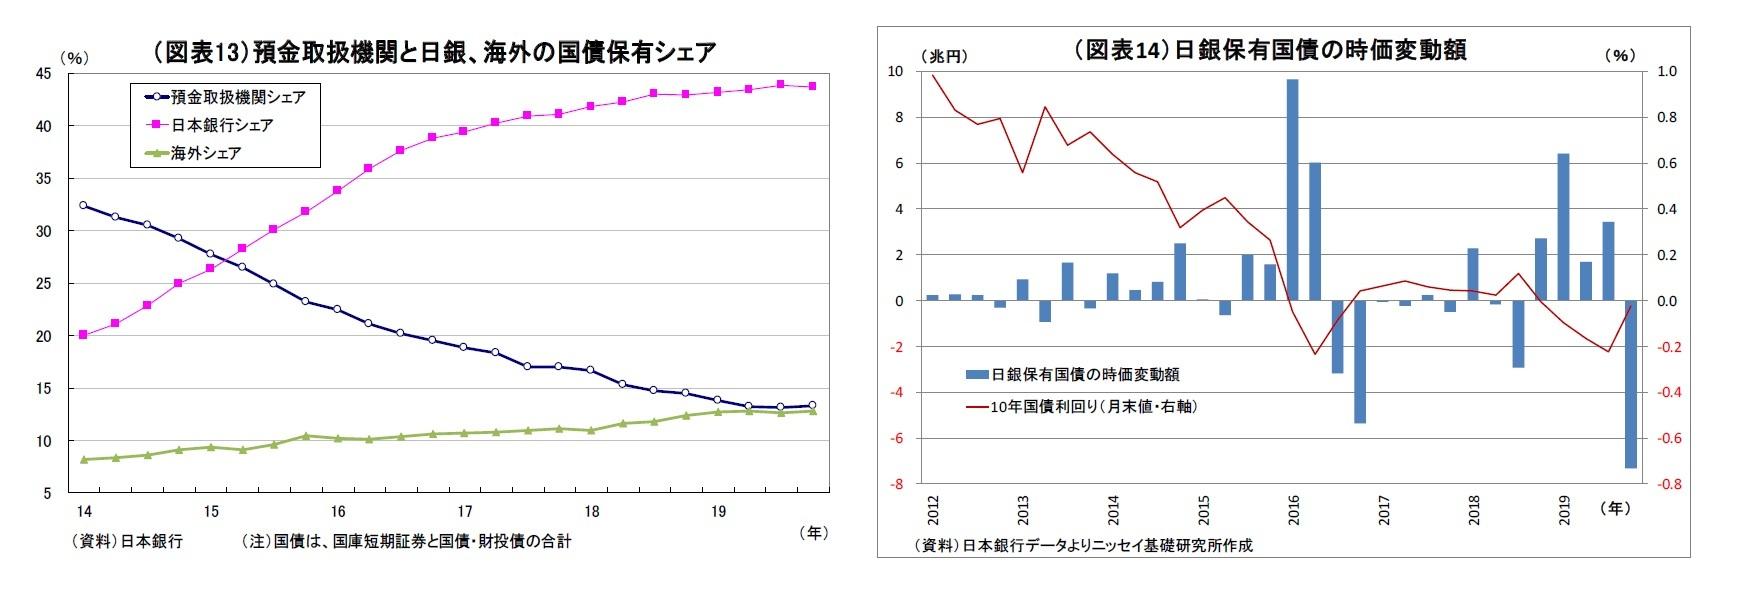 (図表13)預金取扱機関と日銀、海外の国債保有シェア/(図表14)日銀保有国債の時価変動額